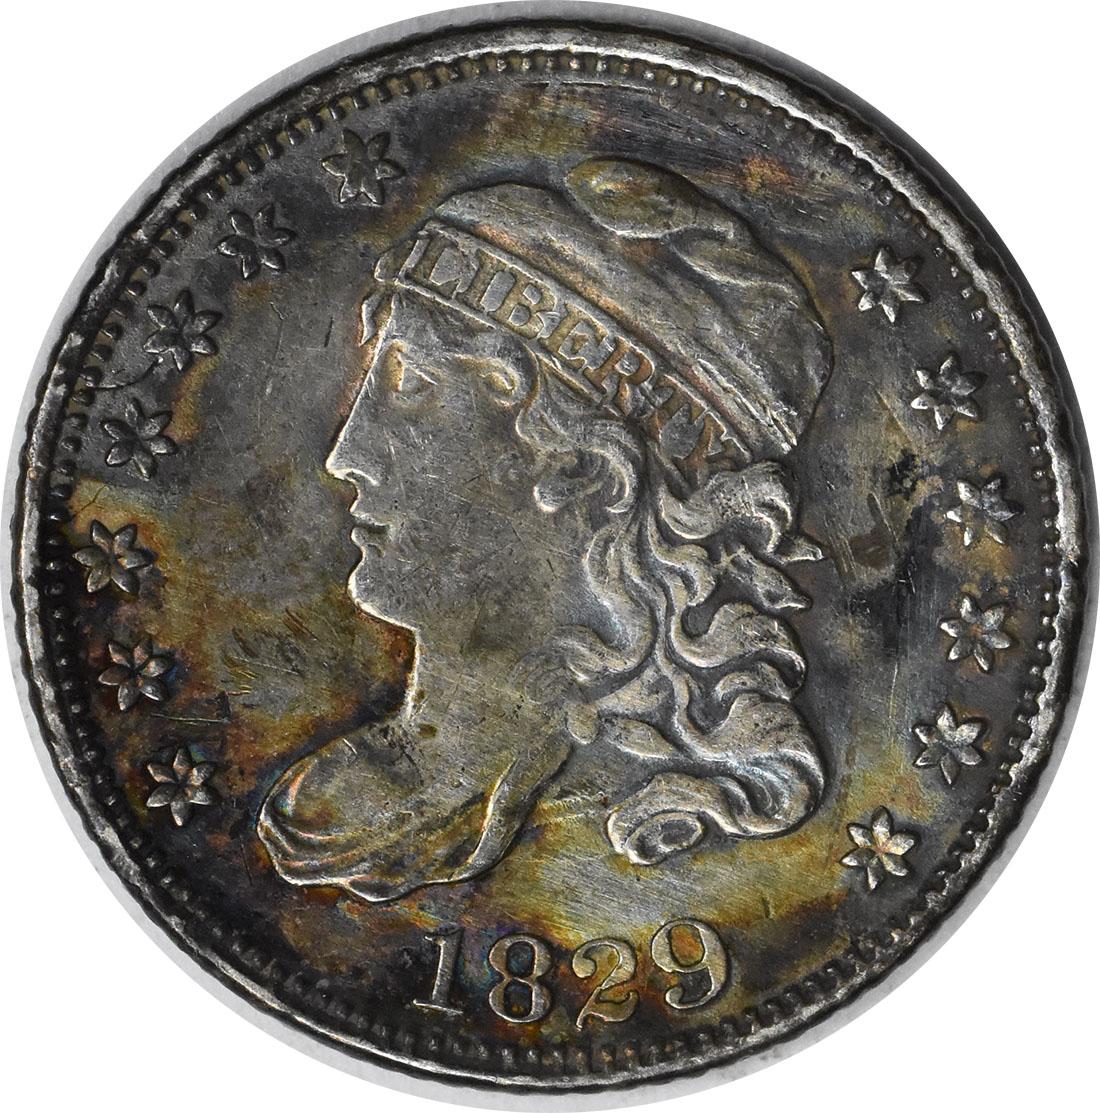 1829 Bust Silver Half Dime EF Uncertified #109